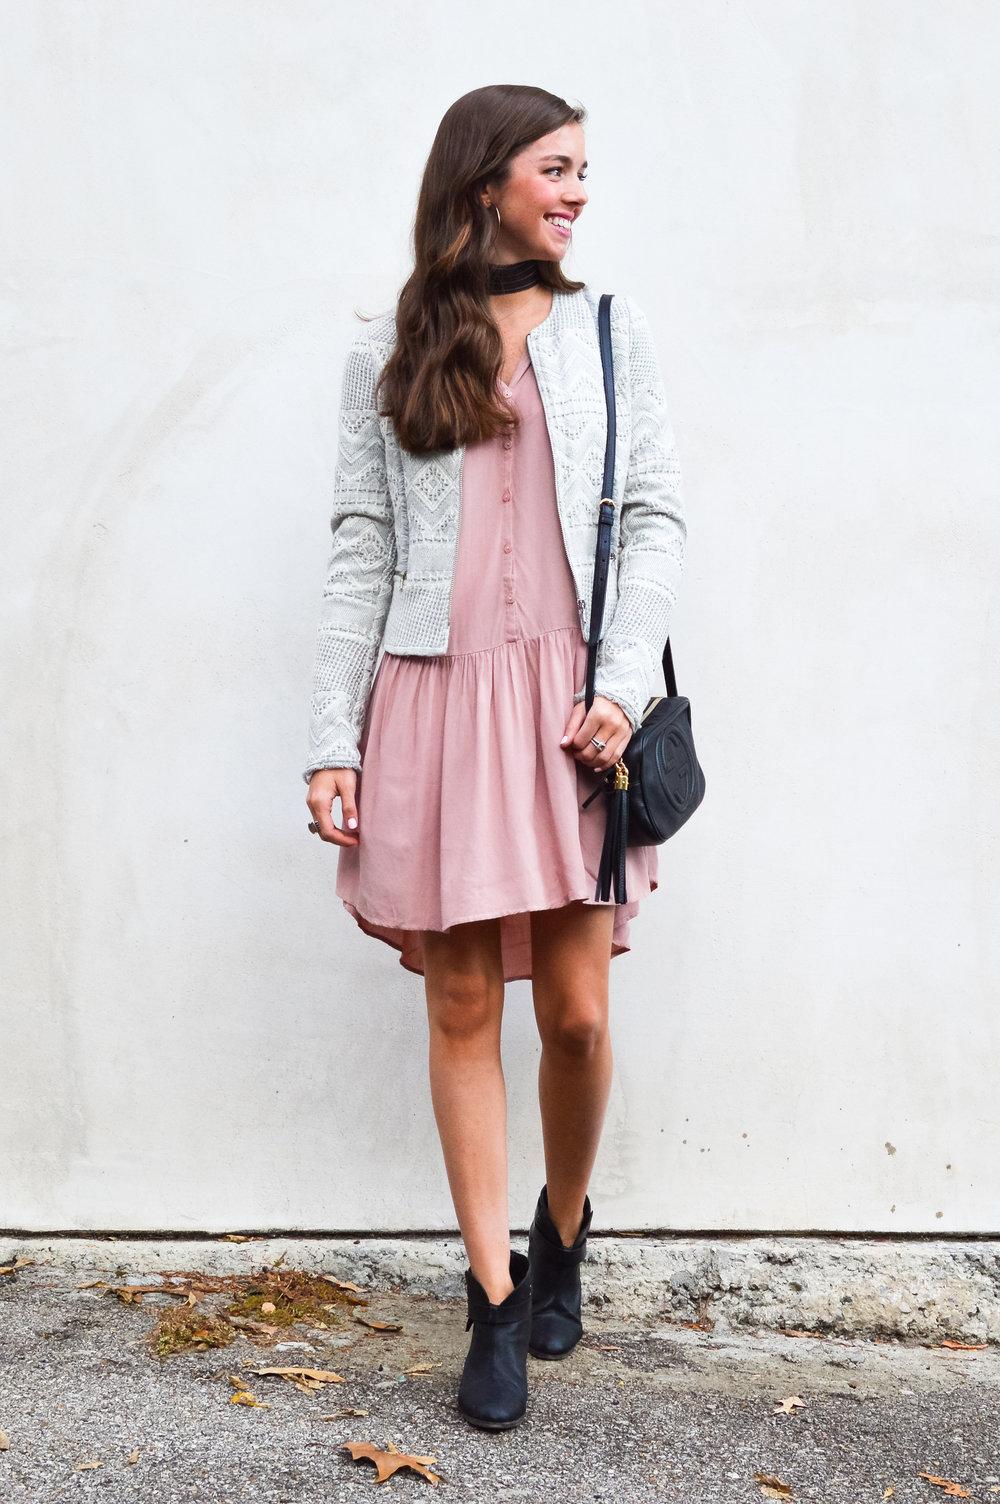 fashion blogger lcb style rag and bone booties fall fashion zara (12 of 23).jpg